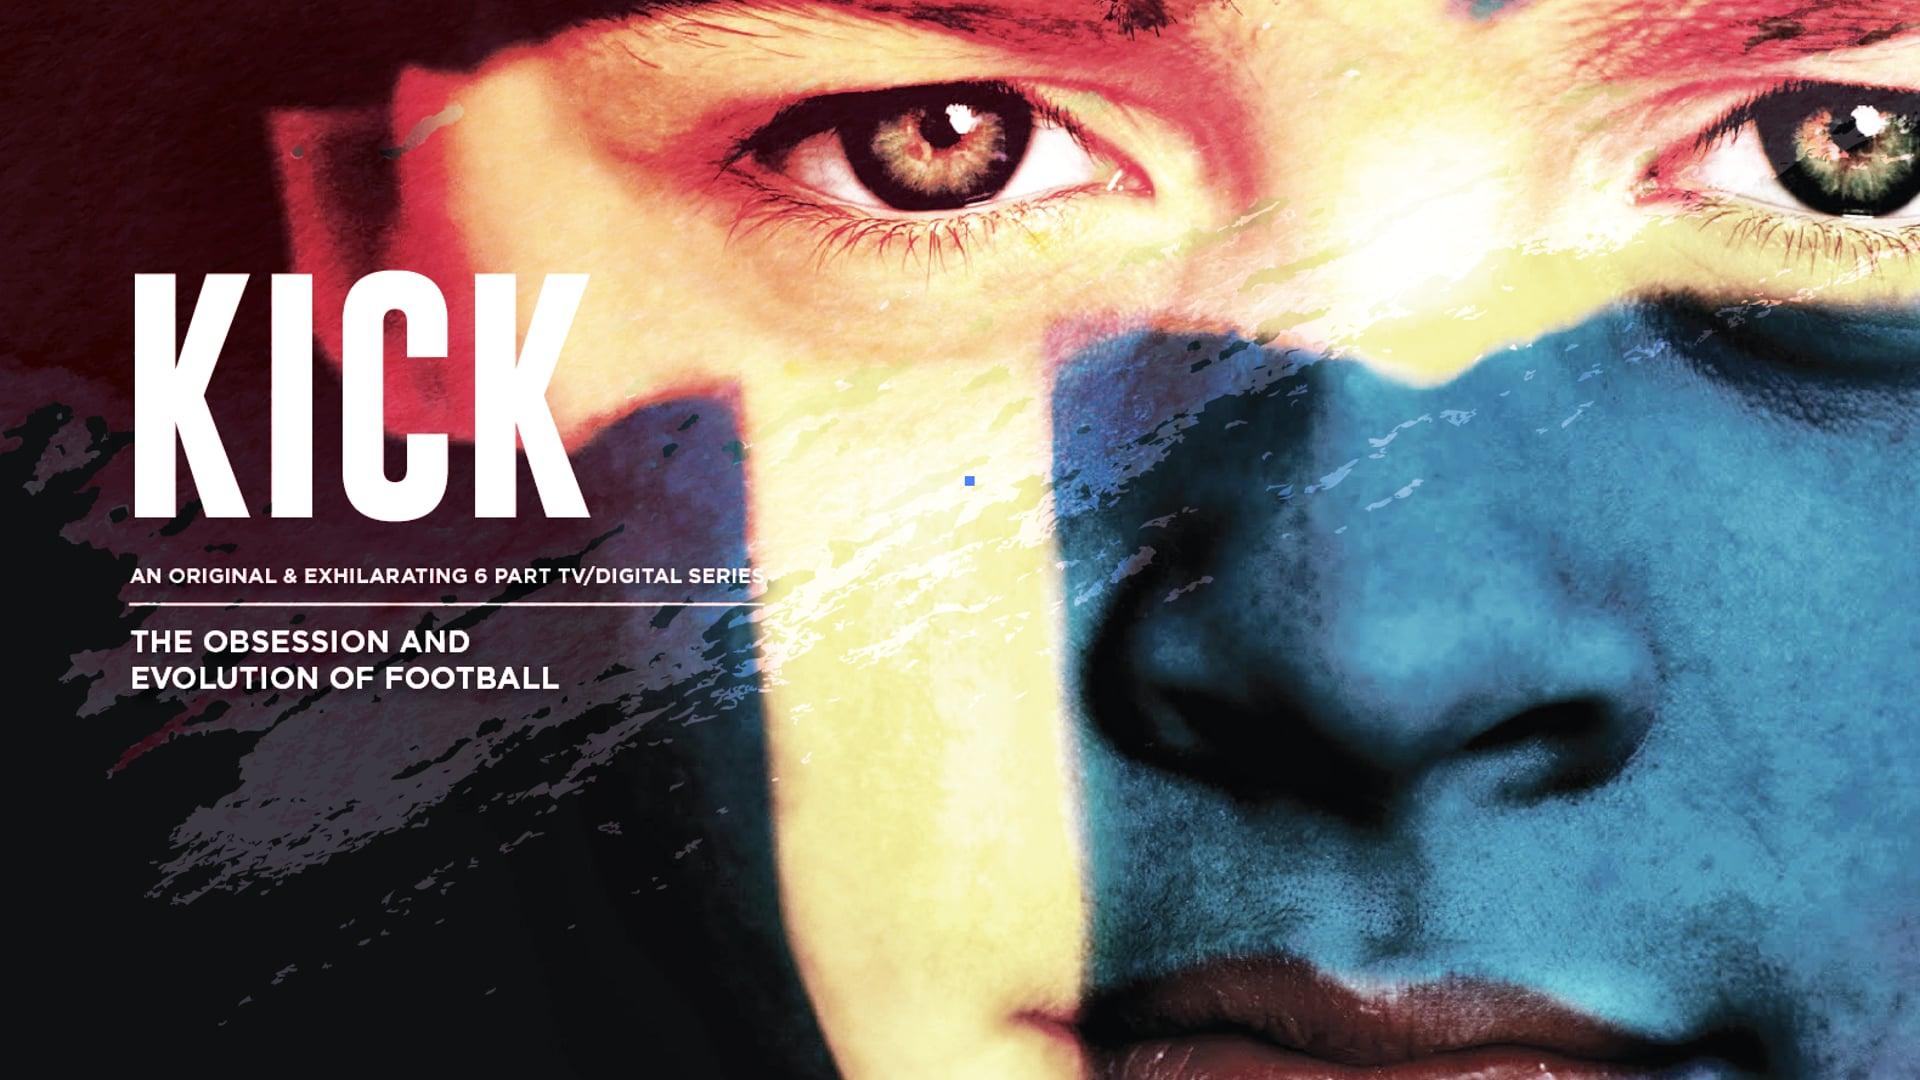 KICK - Extended promo trailer